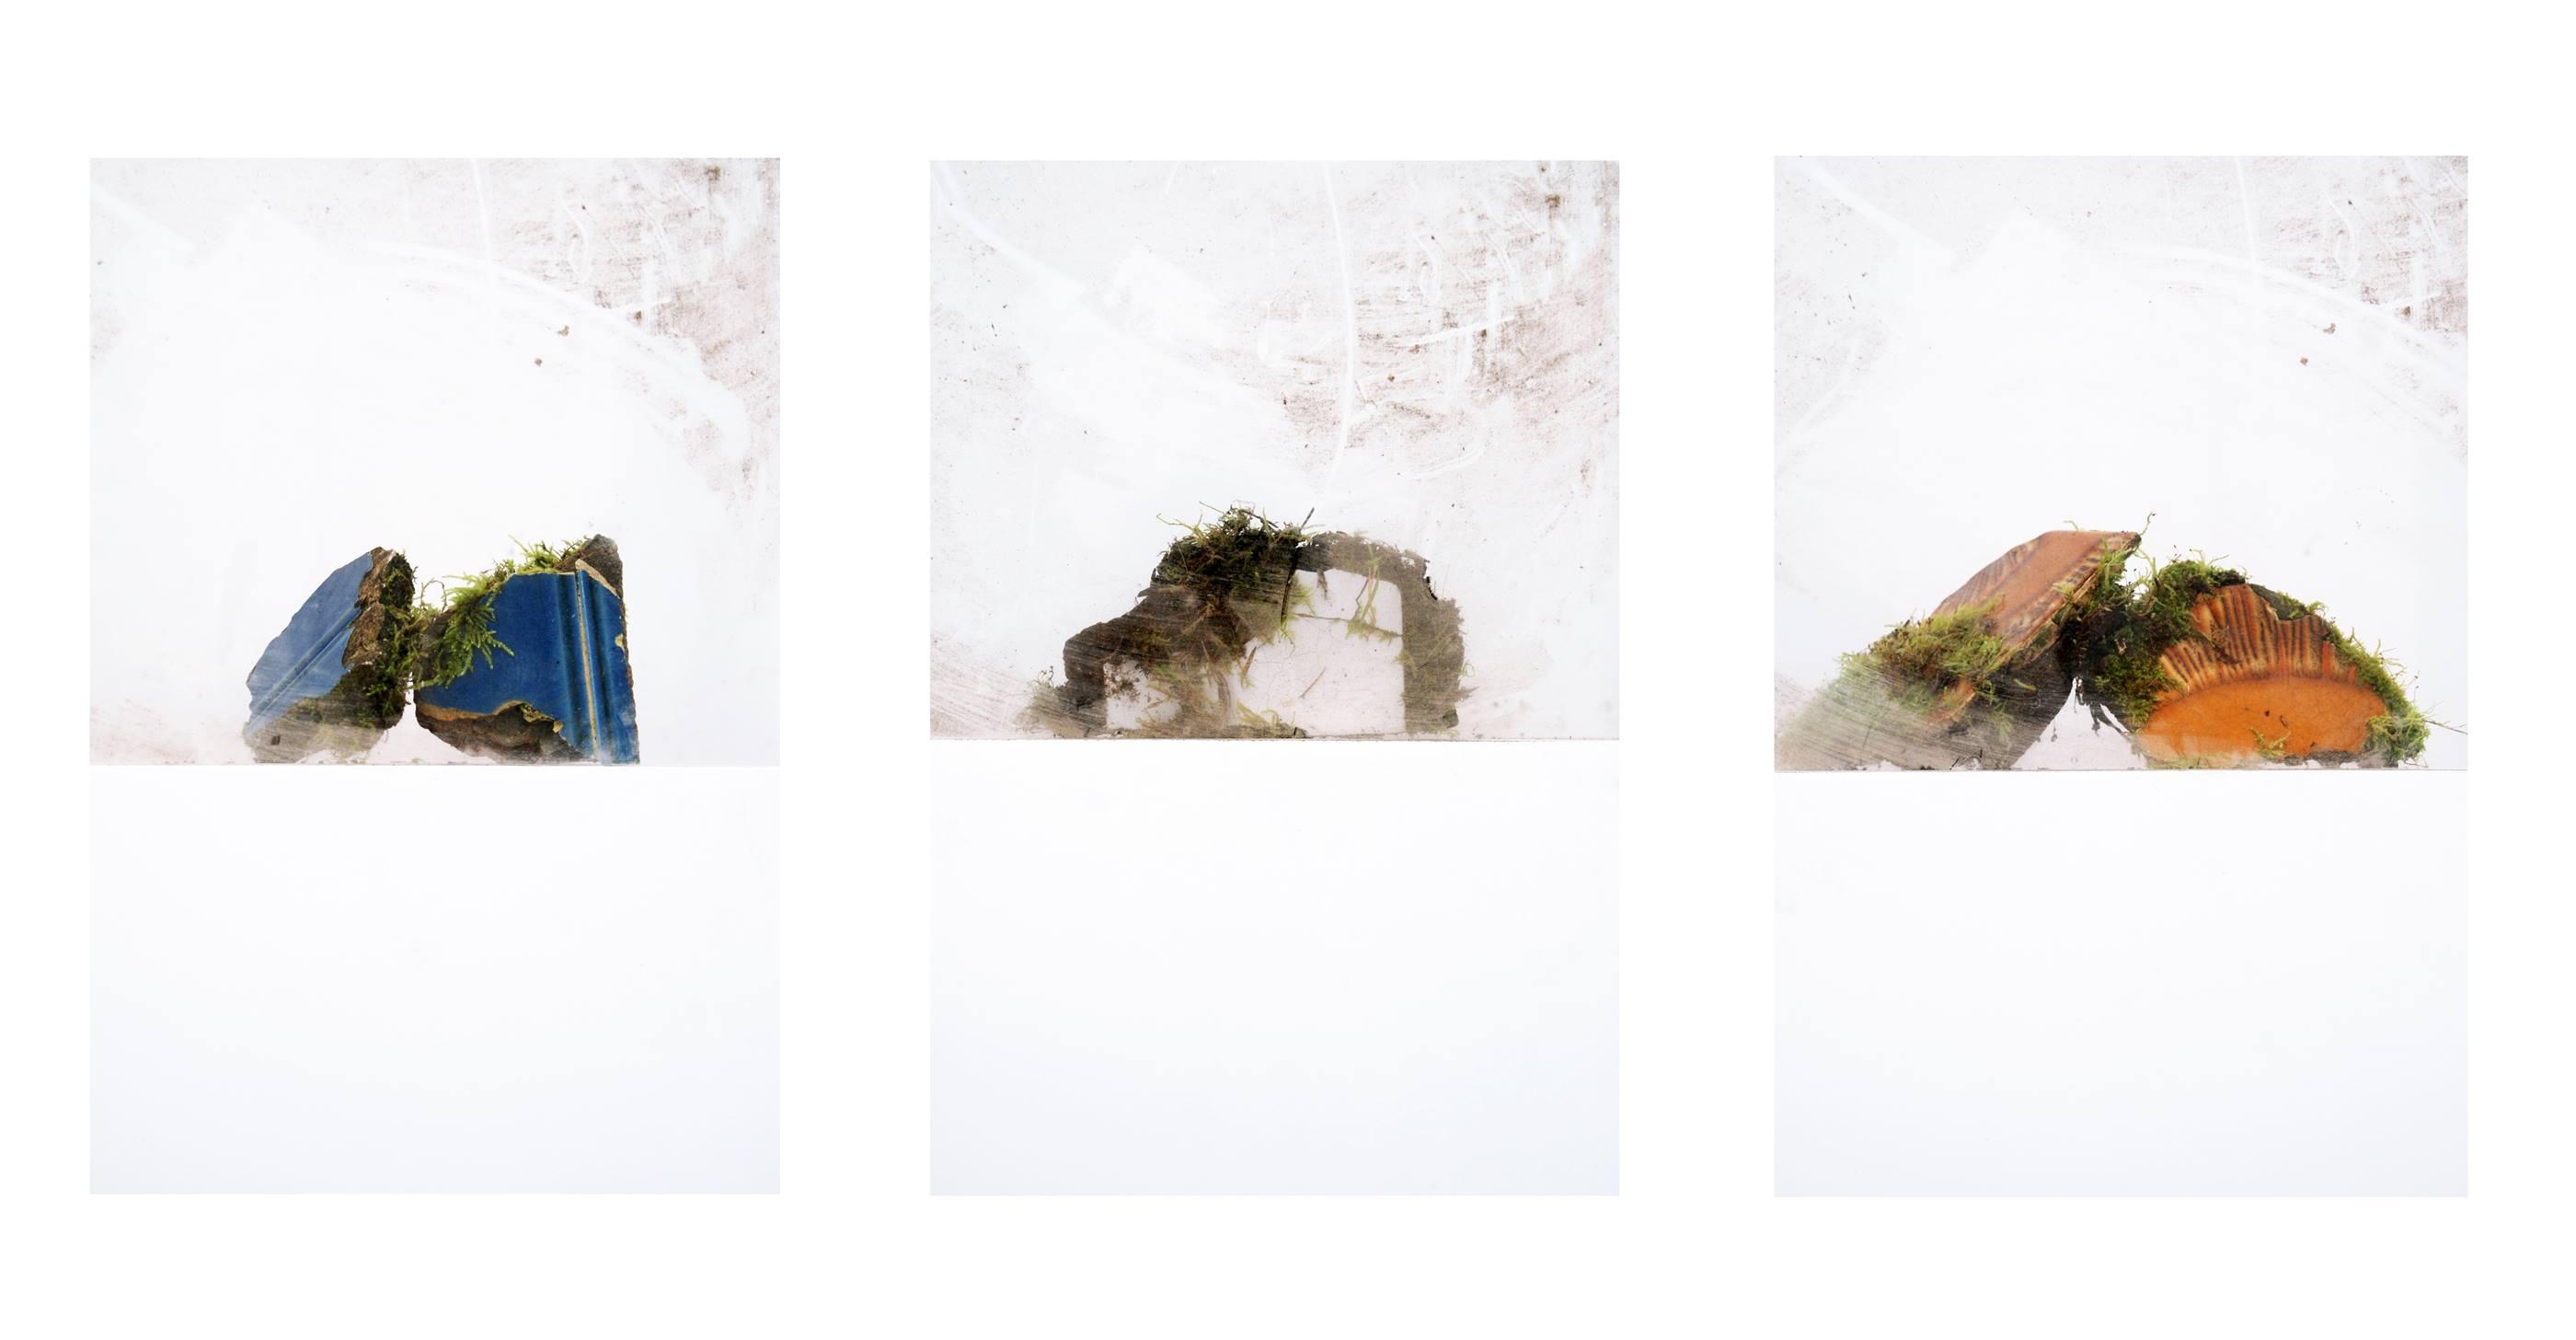 Dalila Gonçalves. Living stones, 2010<br/>